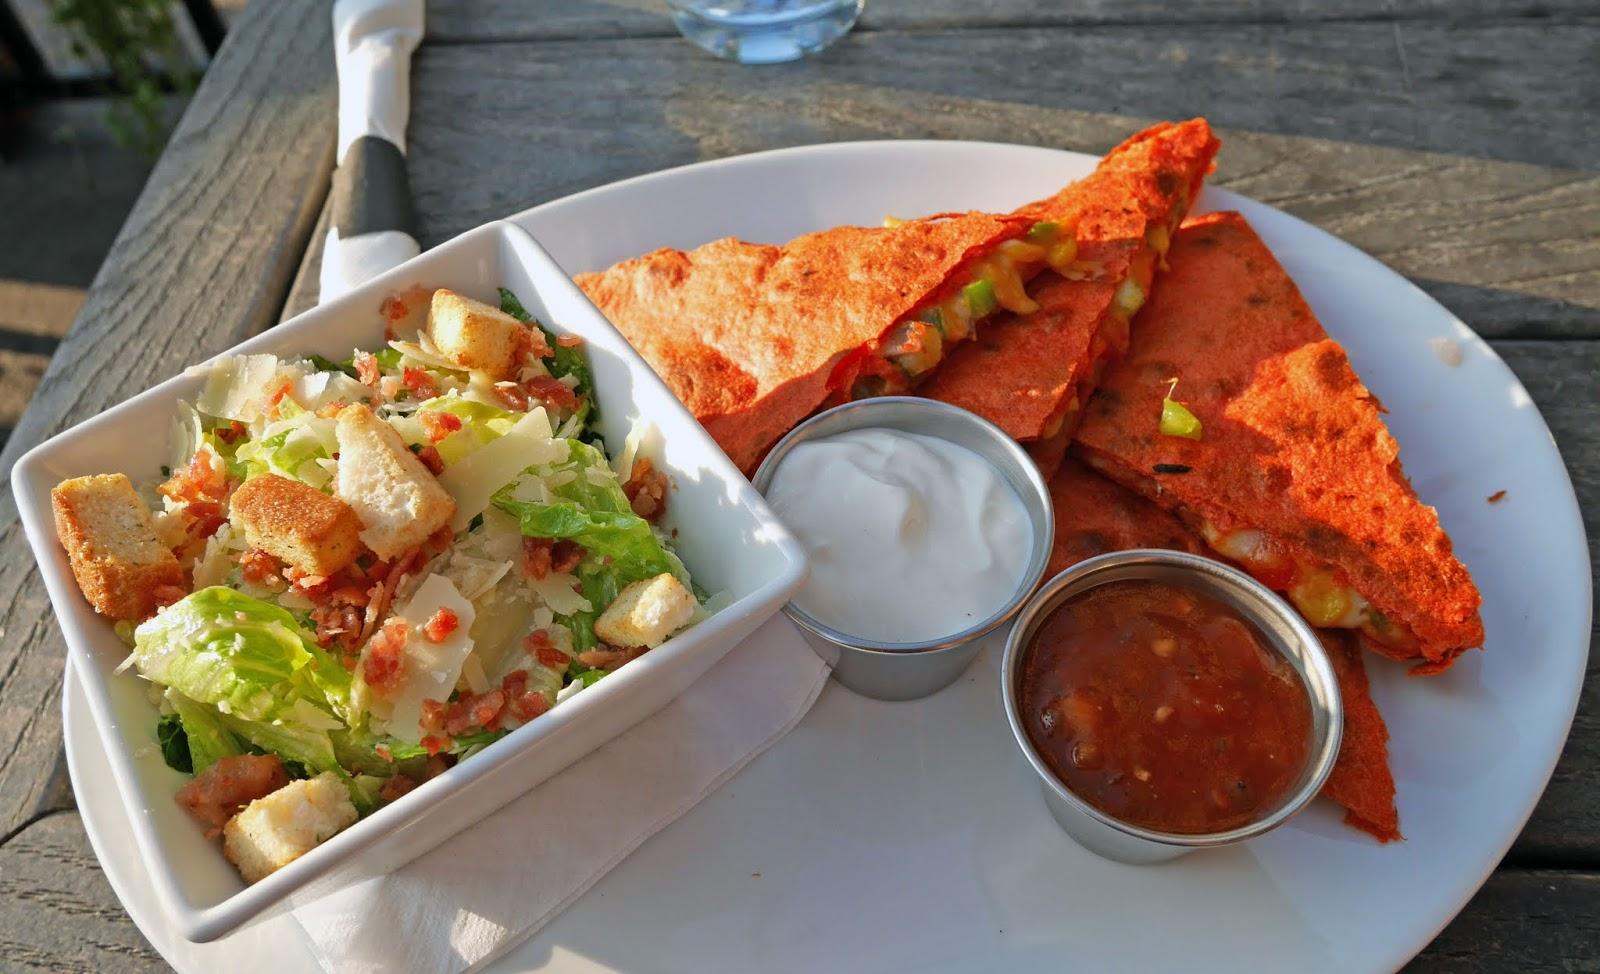 Vegetarian quesadillas for dinner at 4th Spot Kitchen and Bar, Calgary